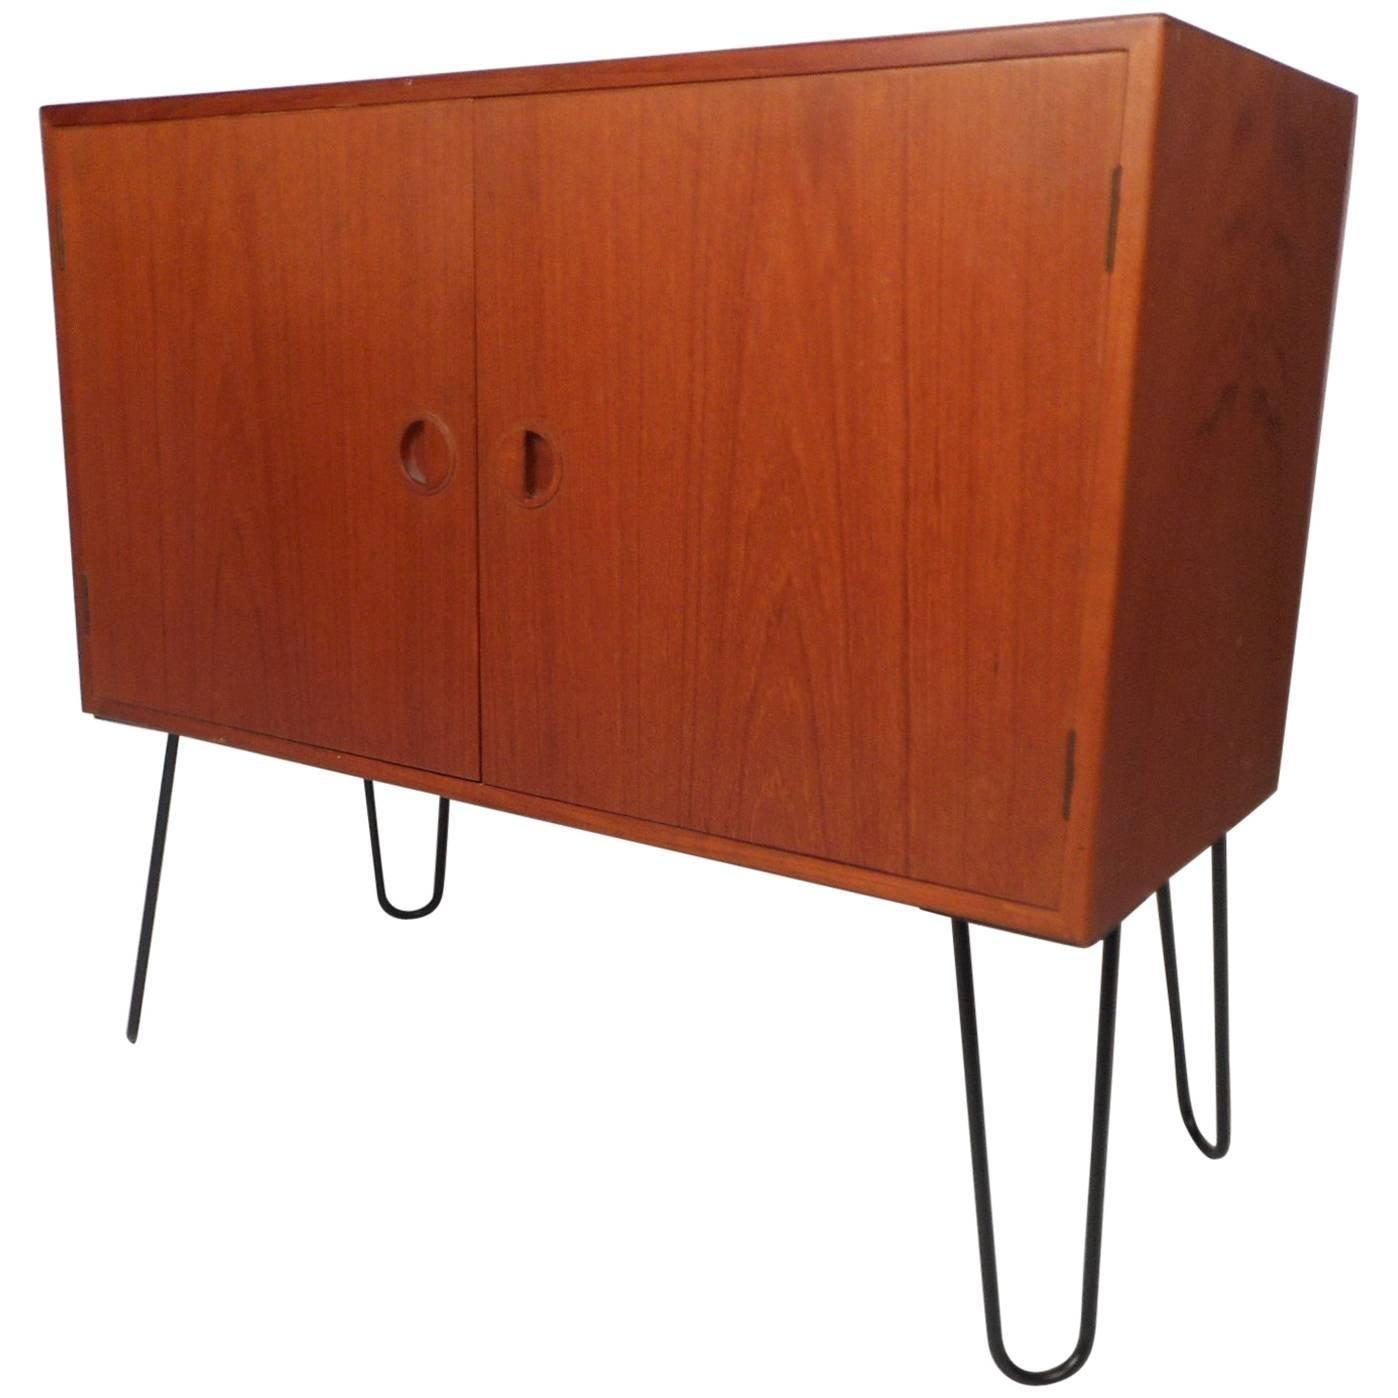 Mid-Century Modern Danish Teak Cabinet with Hairpin Legs